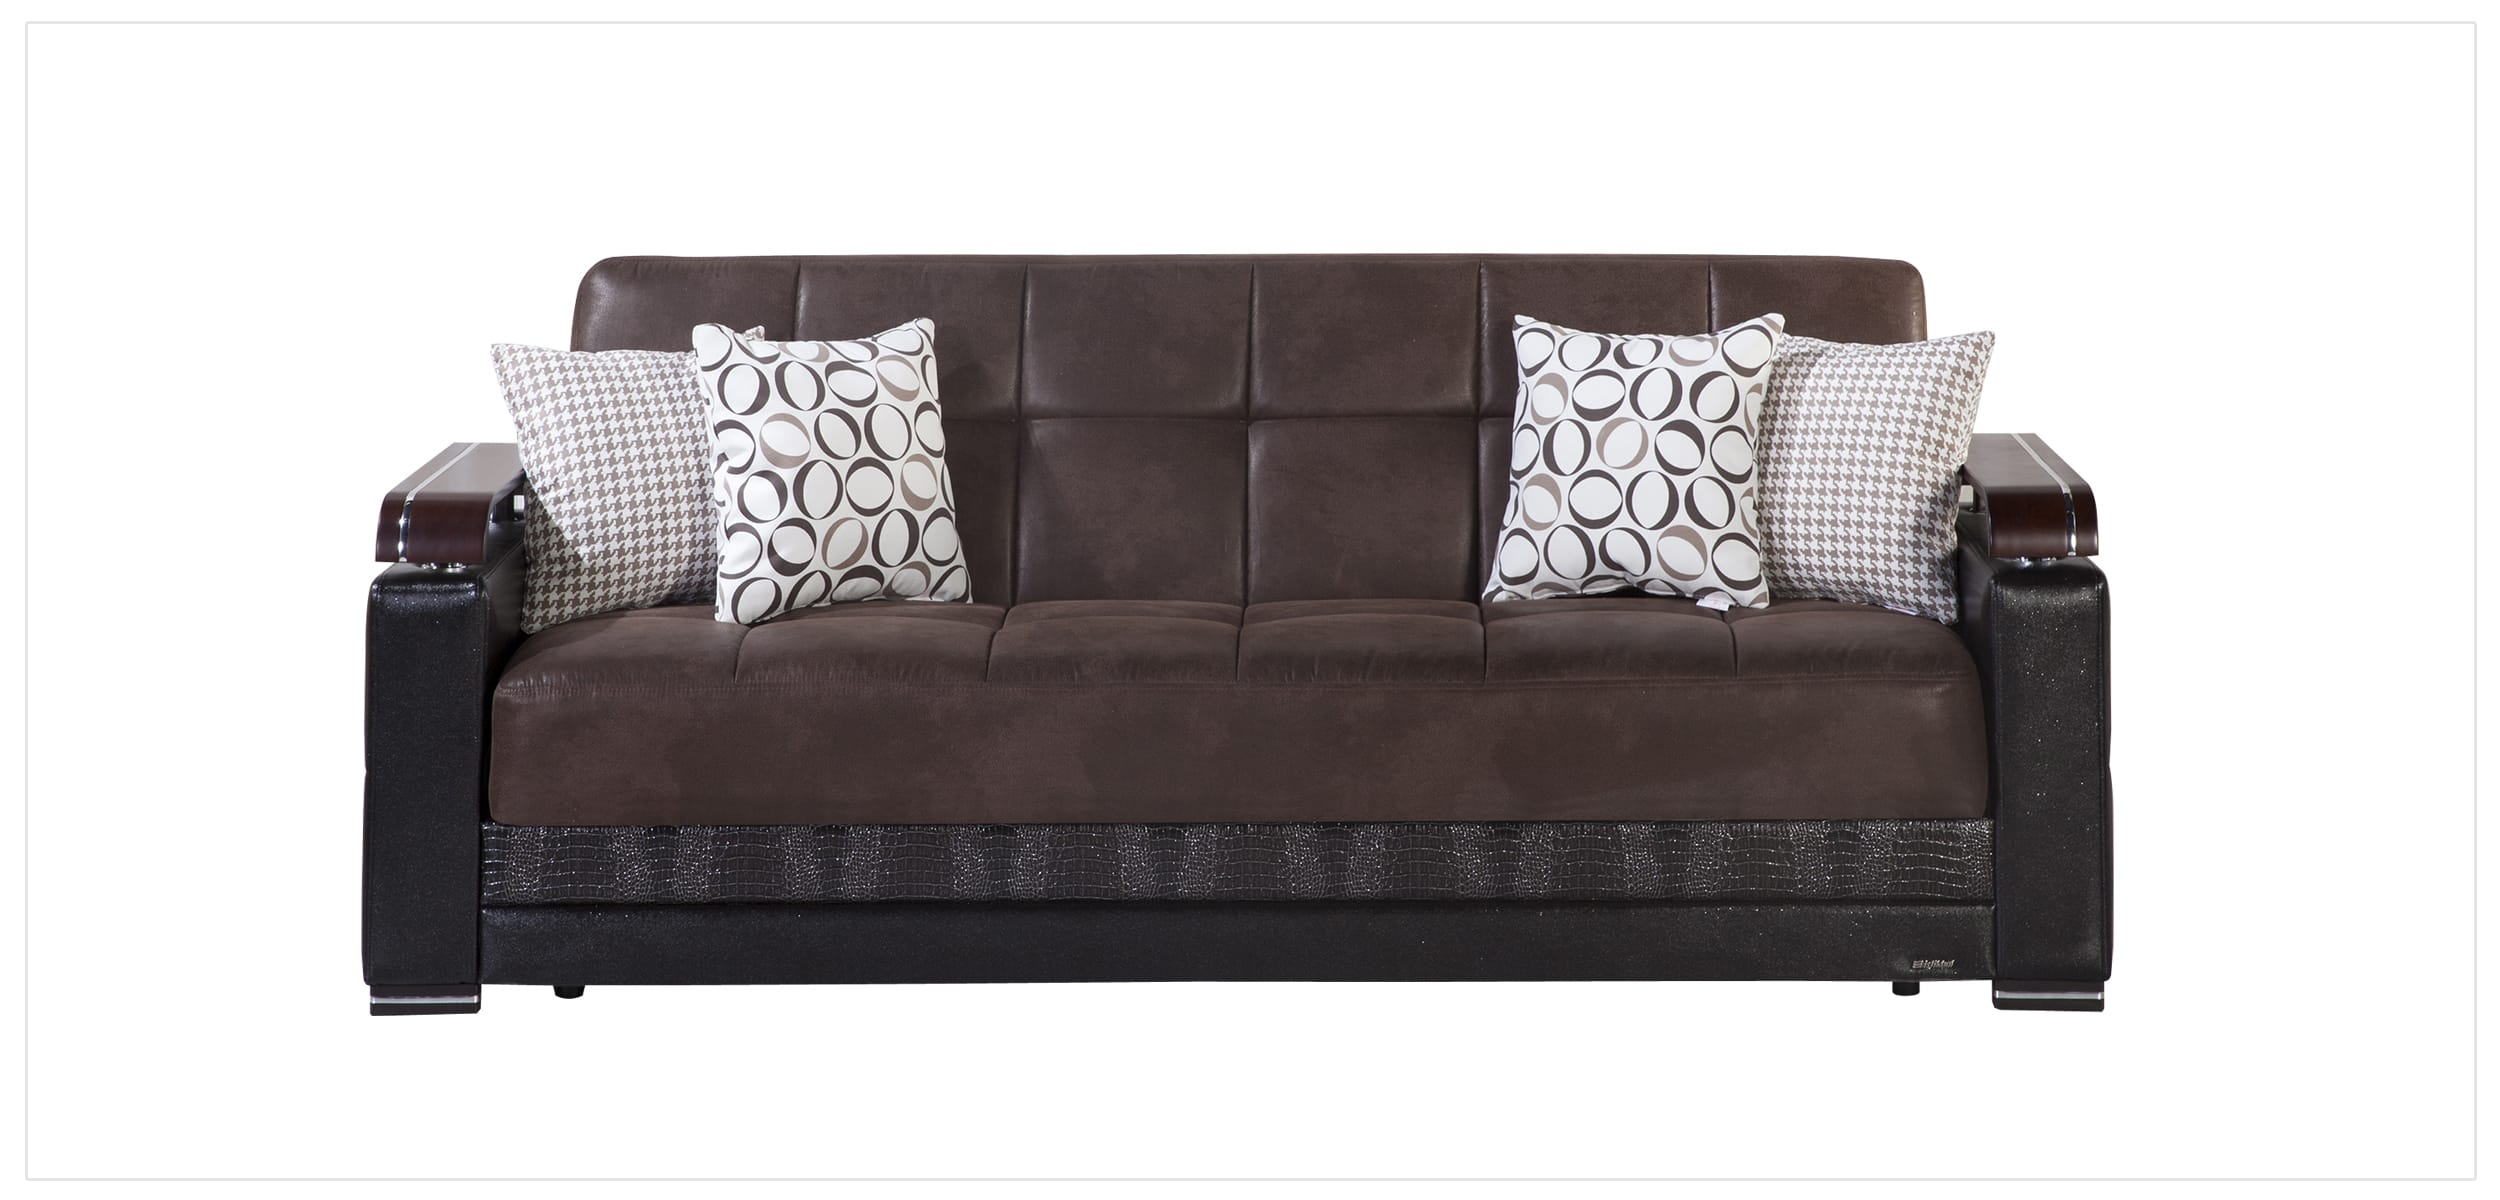 Ekol Chocolate Sofa Love Chair Set By Istikbal Sunset